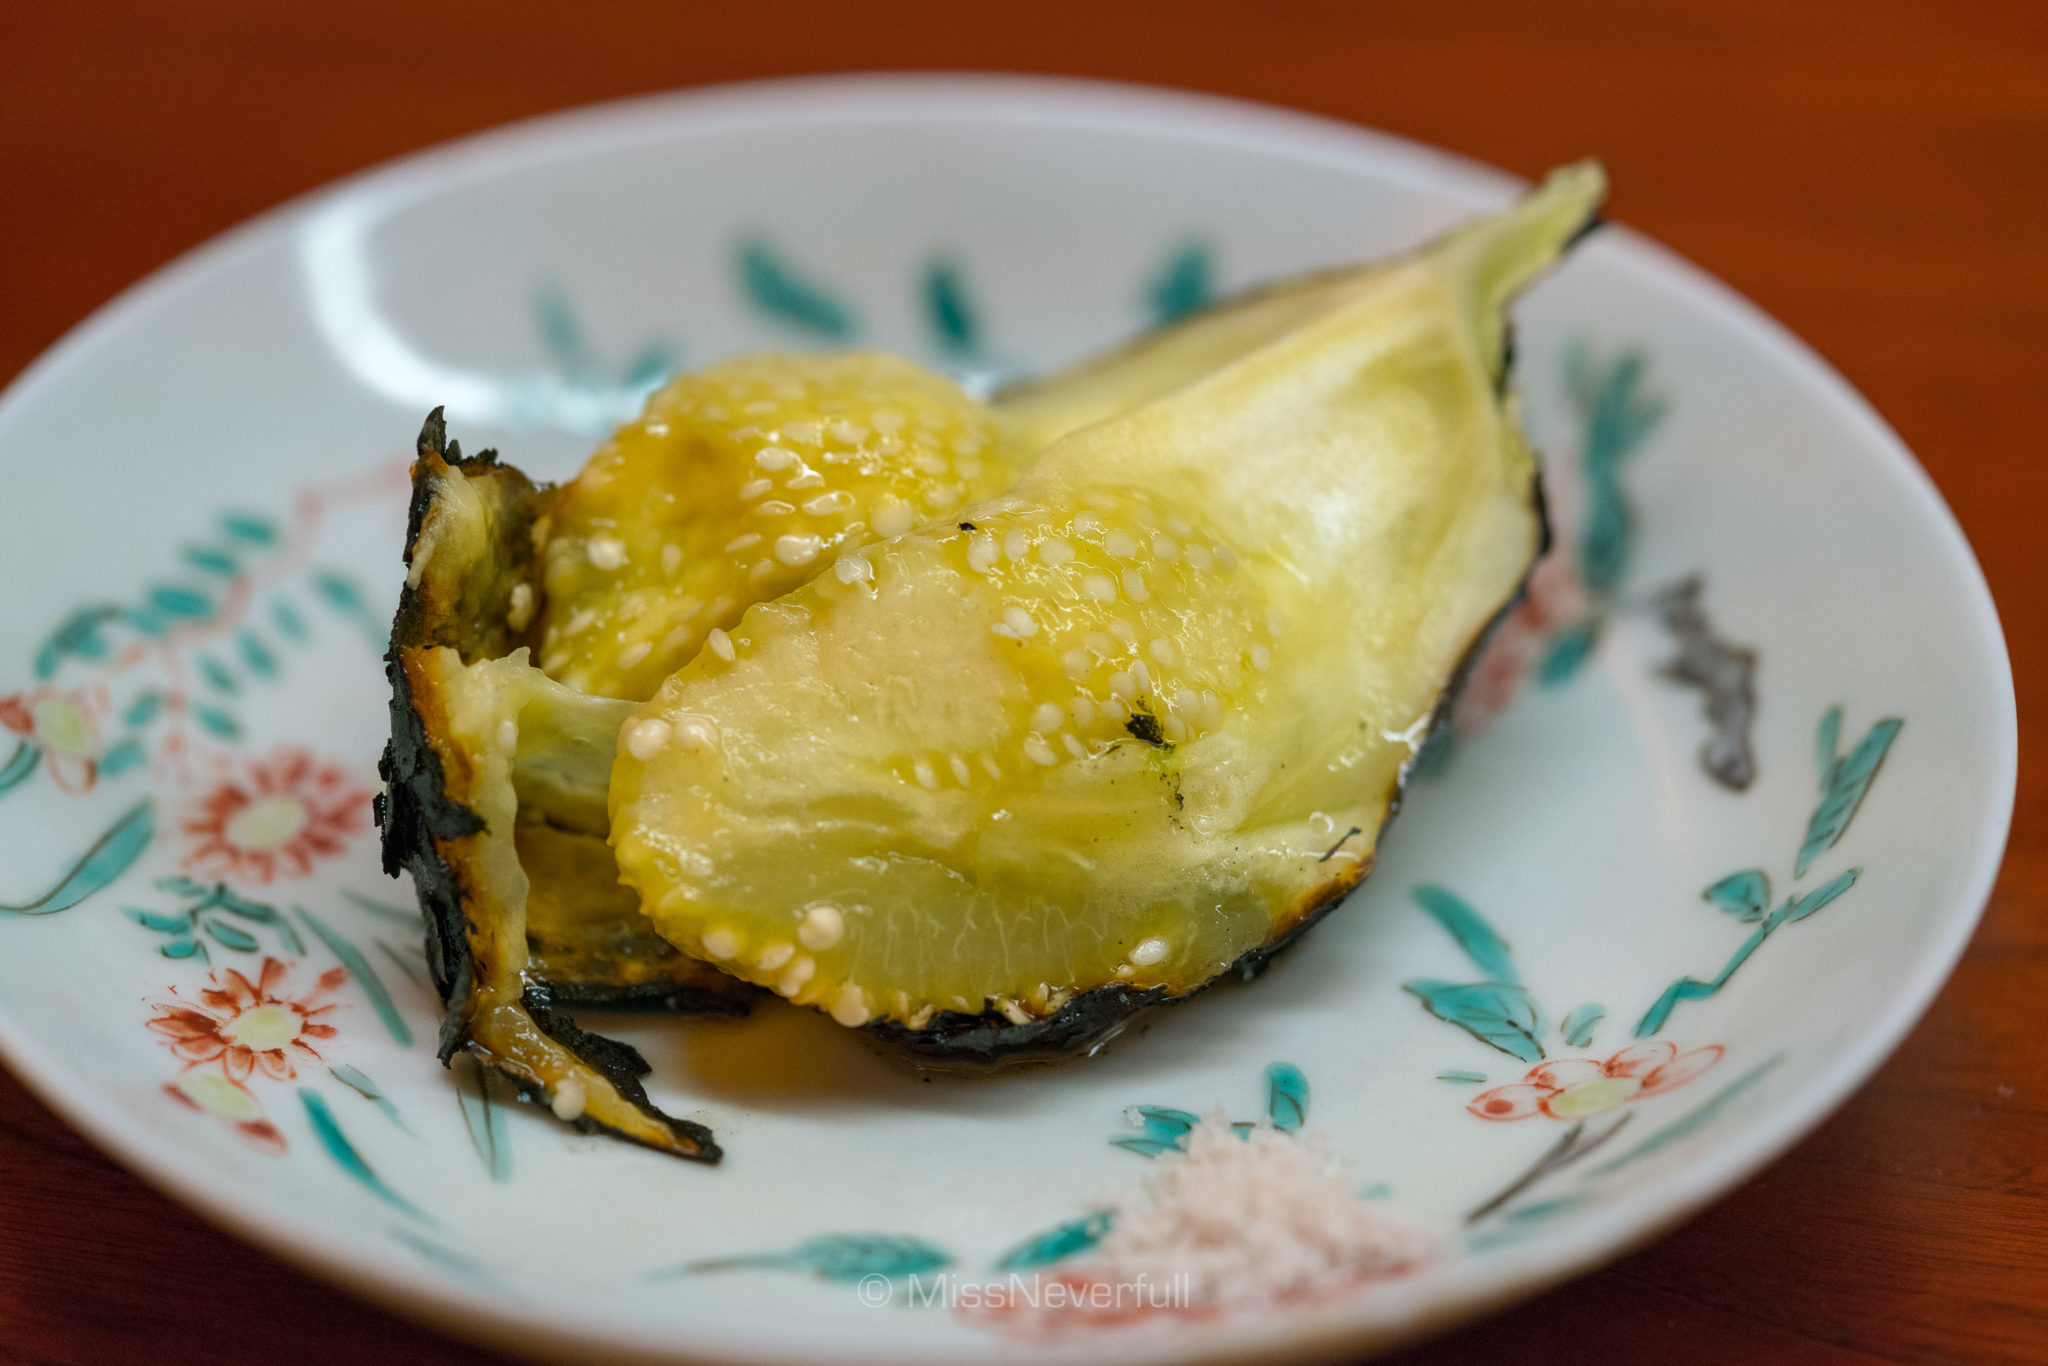 8. Grilled eggplant | 賀茂茄子の焼物dsc02651